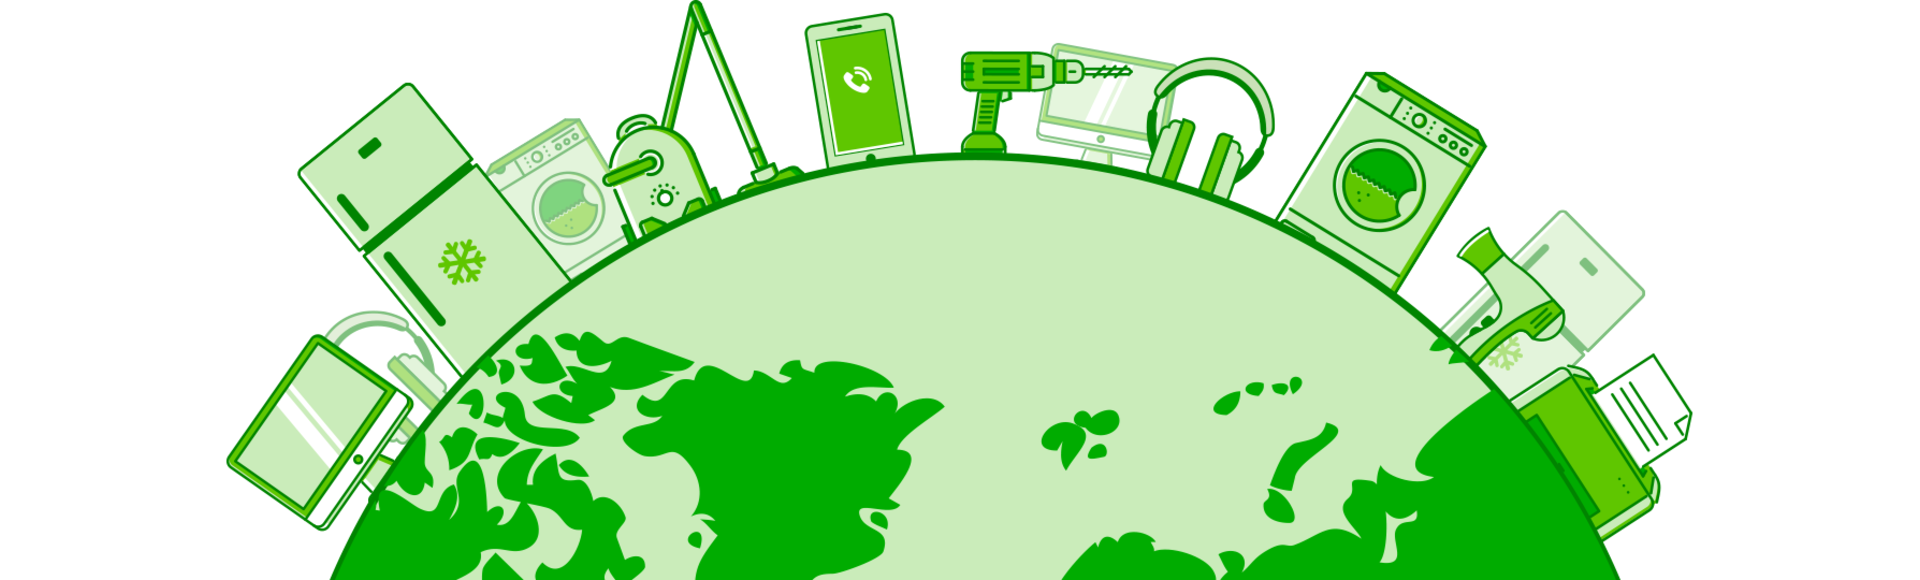 Dia Internacional dos Resíduos Elétricos